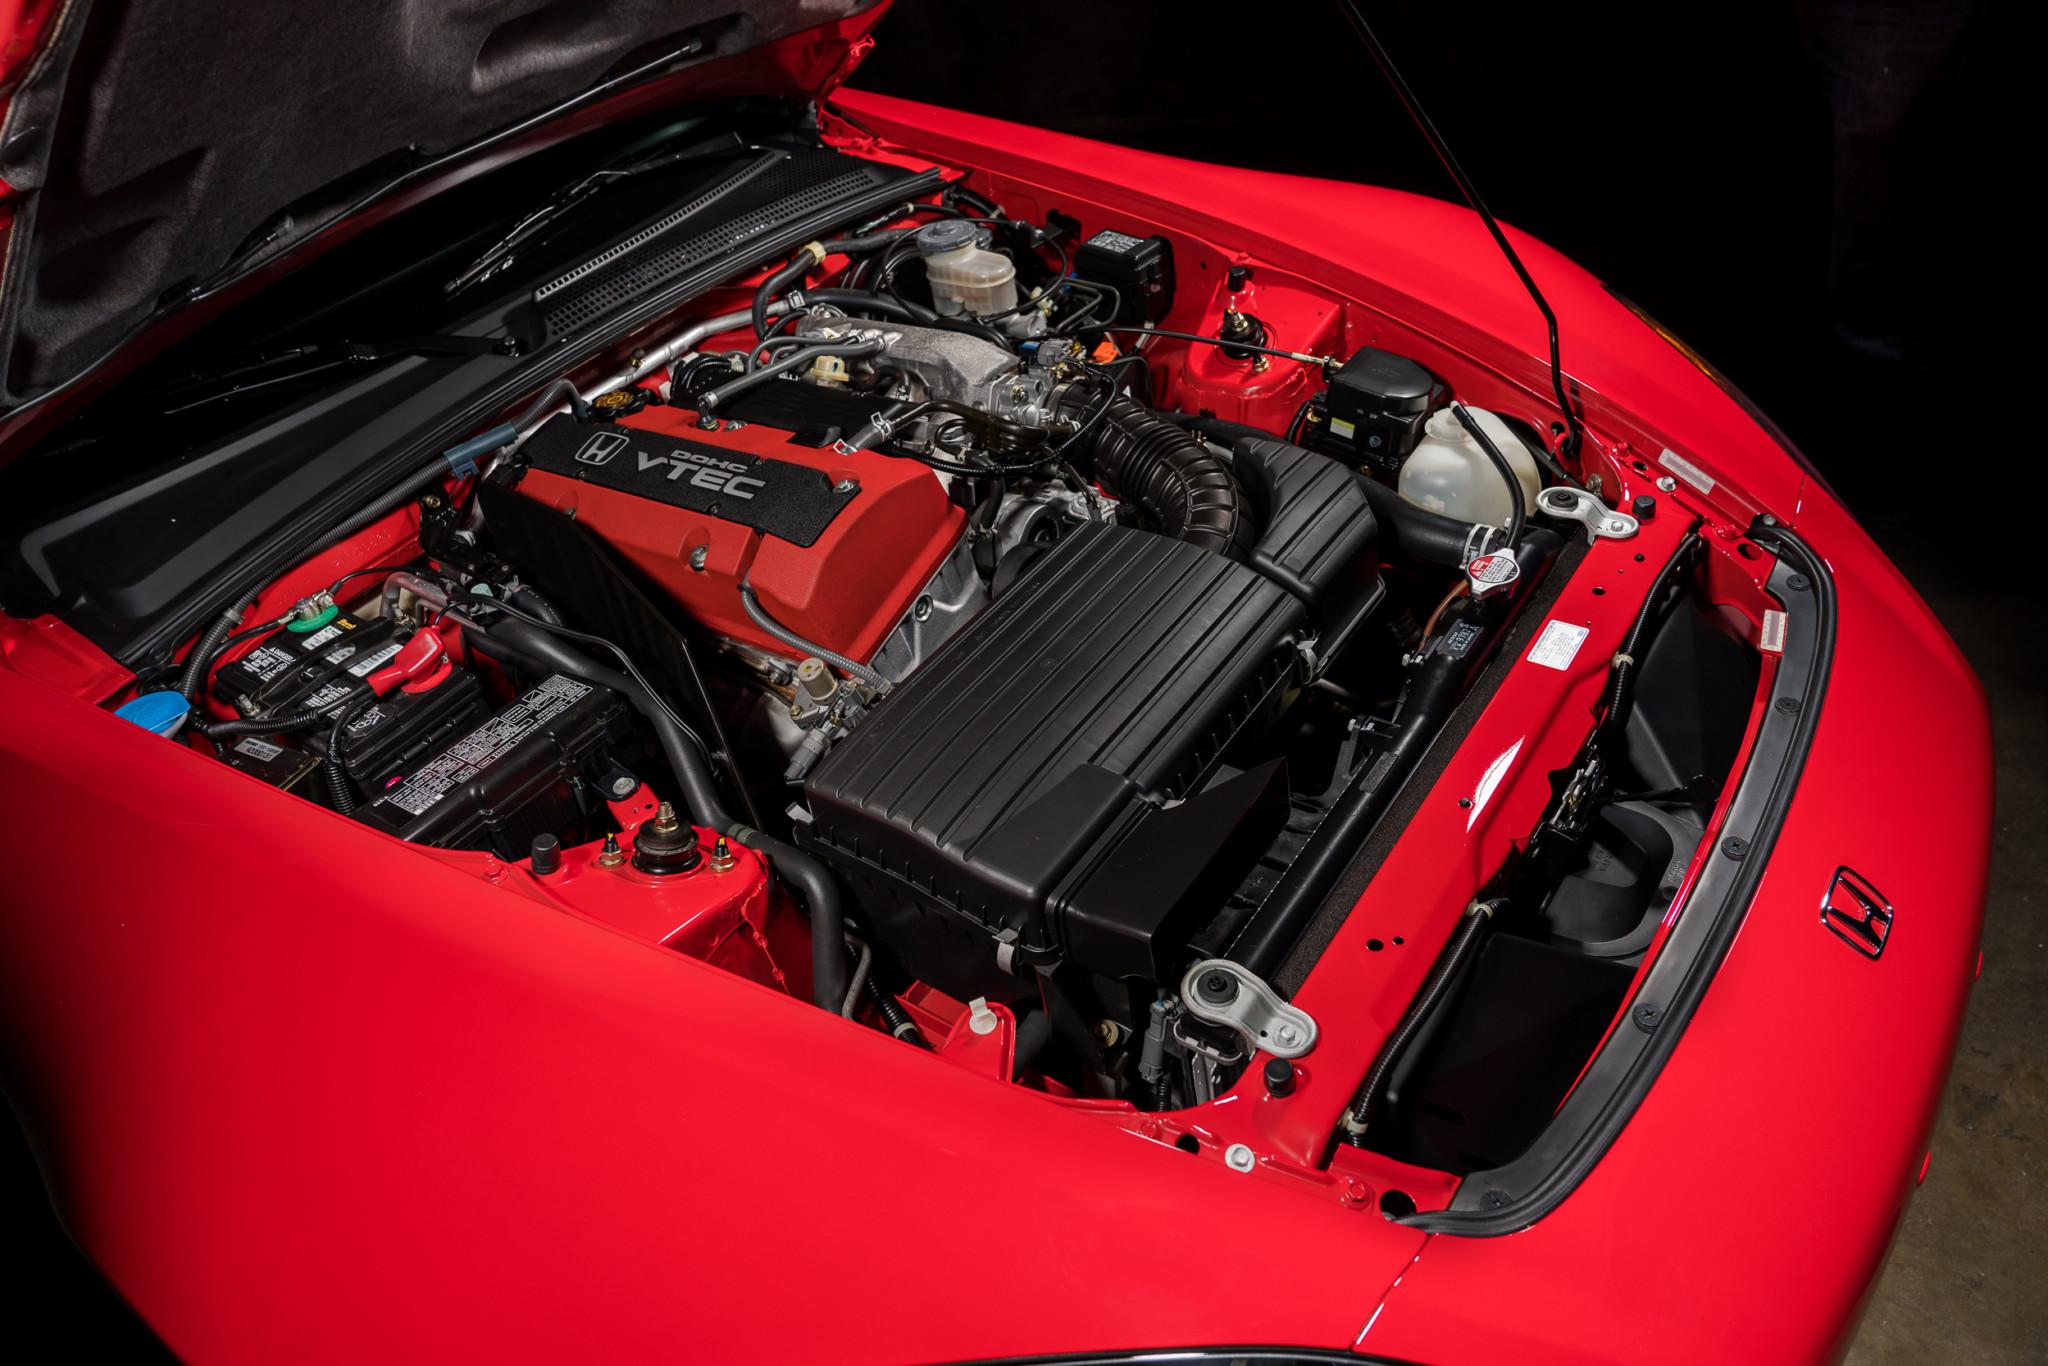 2000 Honda S2000 Engine